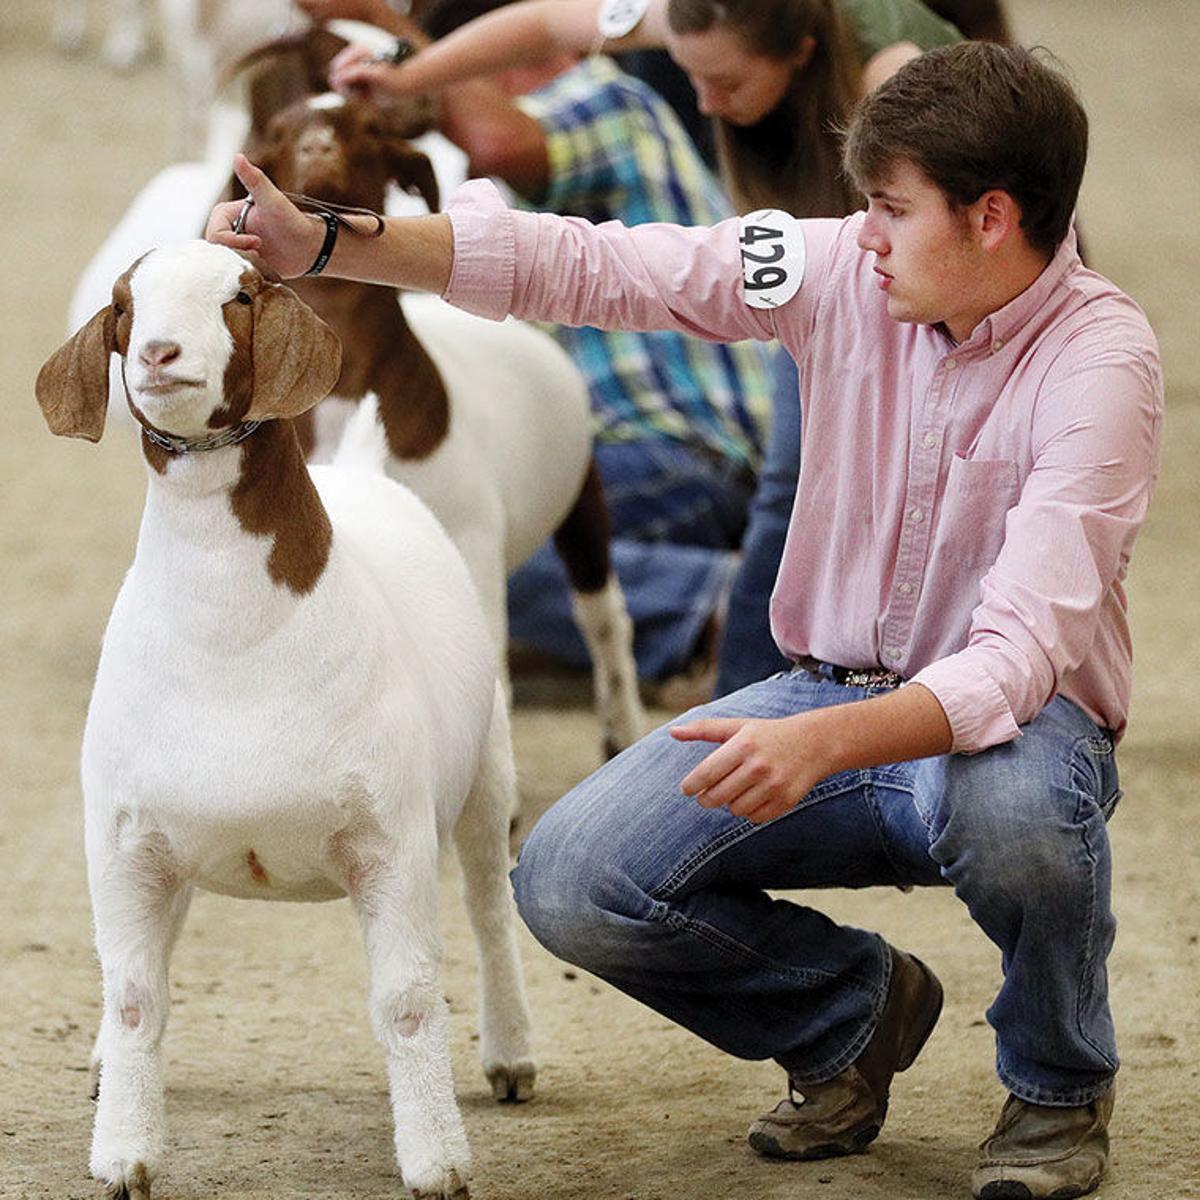 Goat industry has growth potential in Nebraska | Family